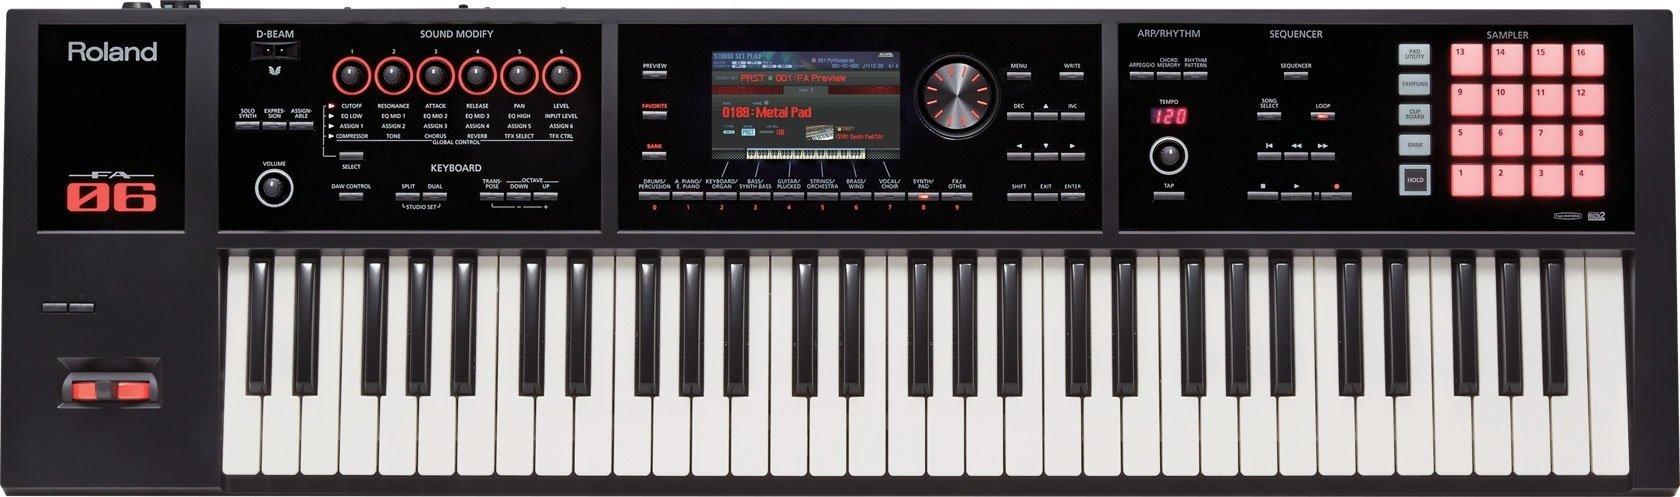 Roland 61-key Music Workstation (FA-06) by Roland